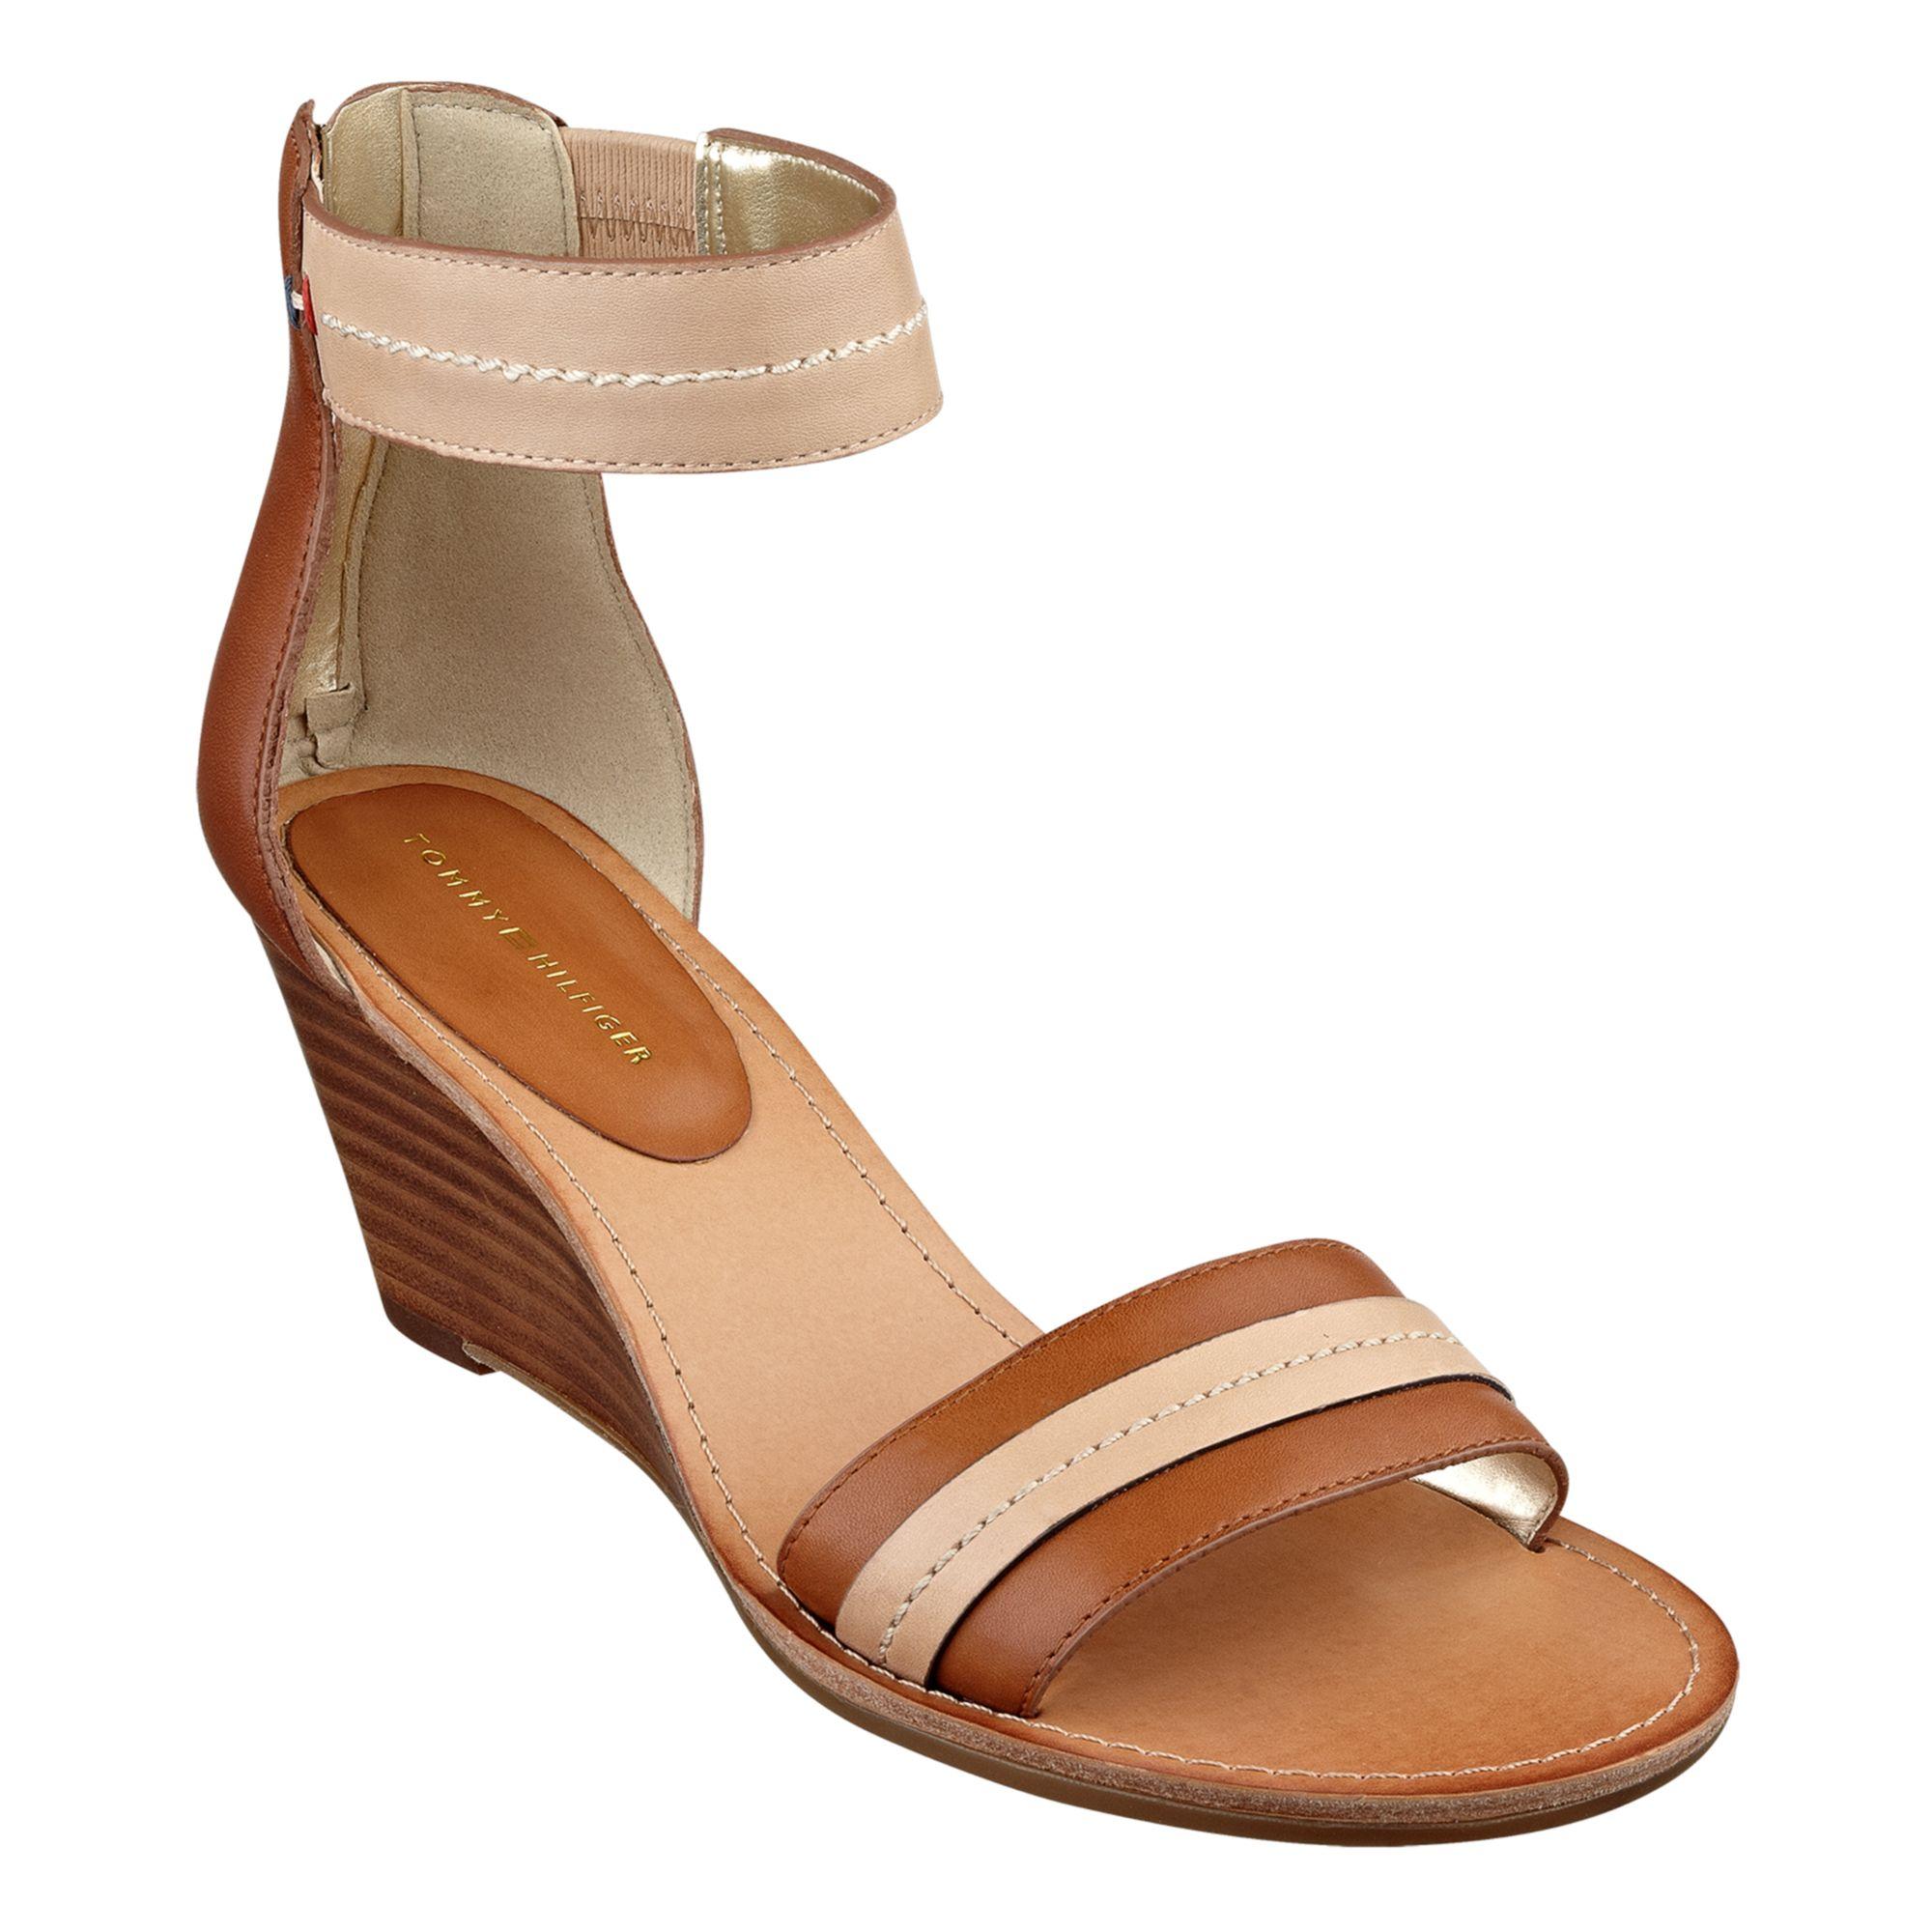 06a8518c204c7 Lyst - Tommy Hilfiger Yara Akle Strap Wedge Sandals in Brown